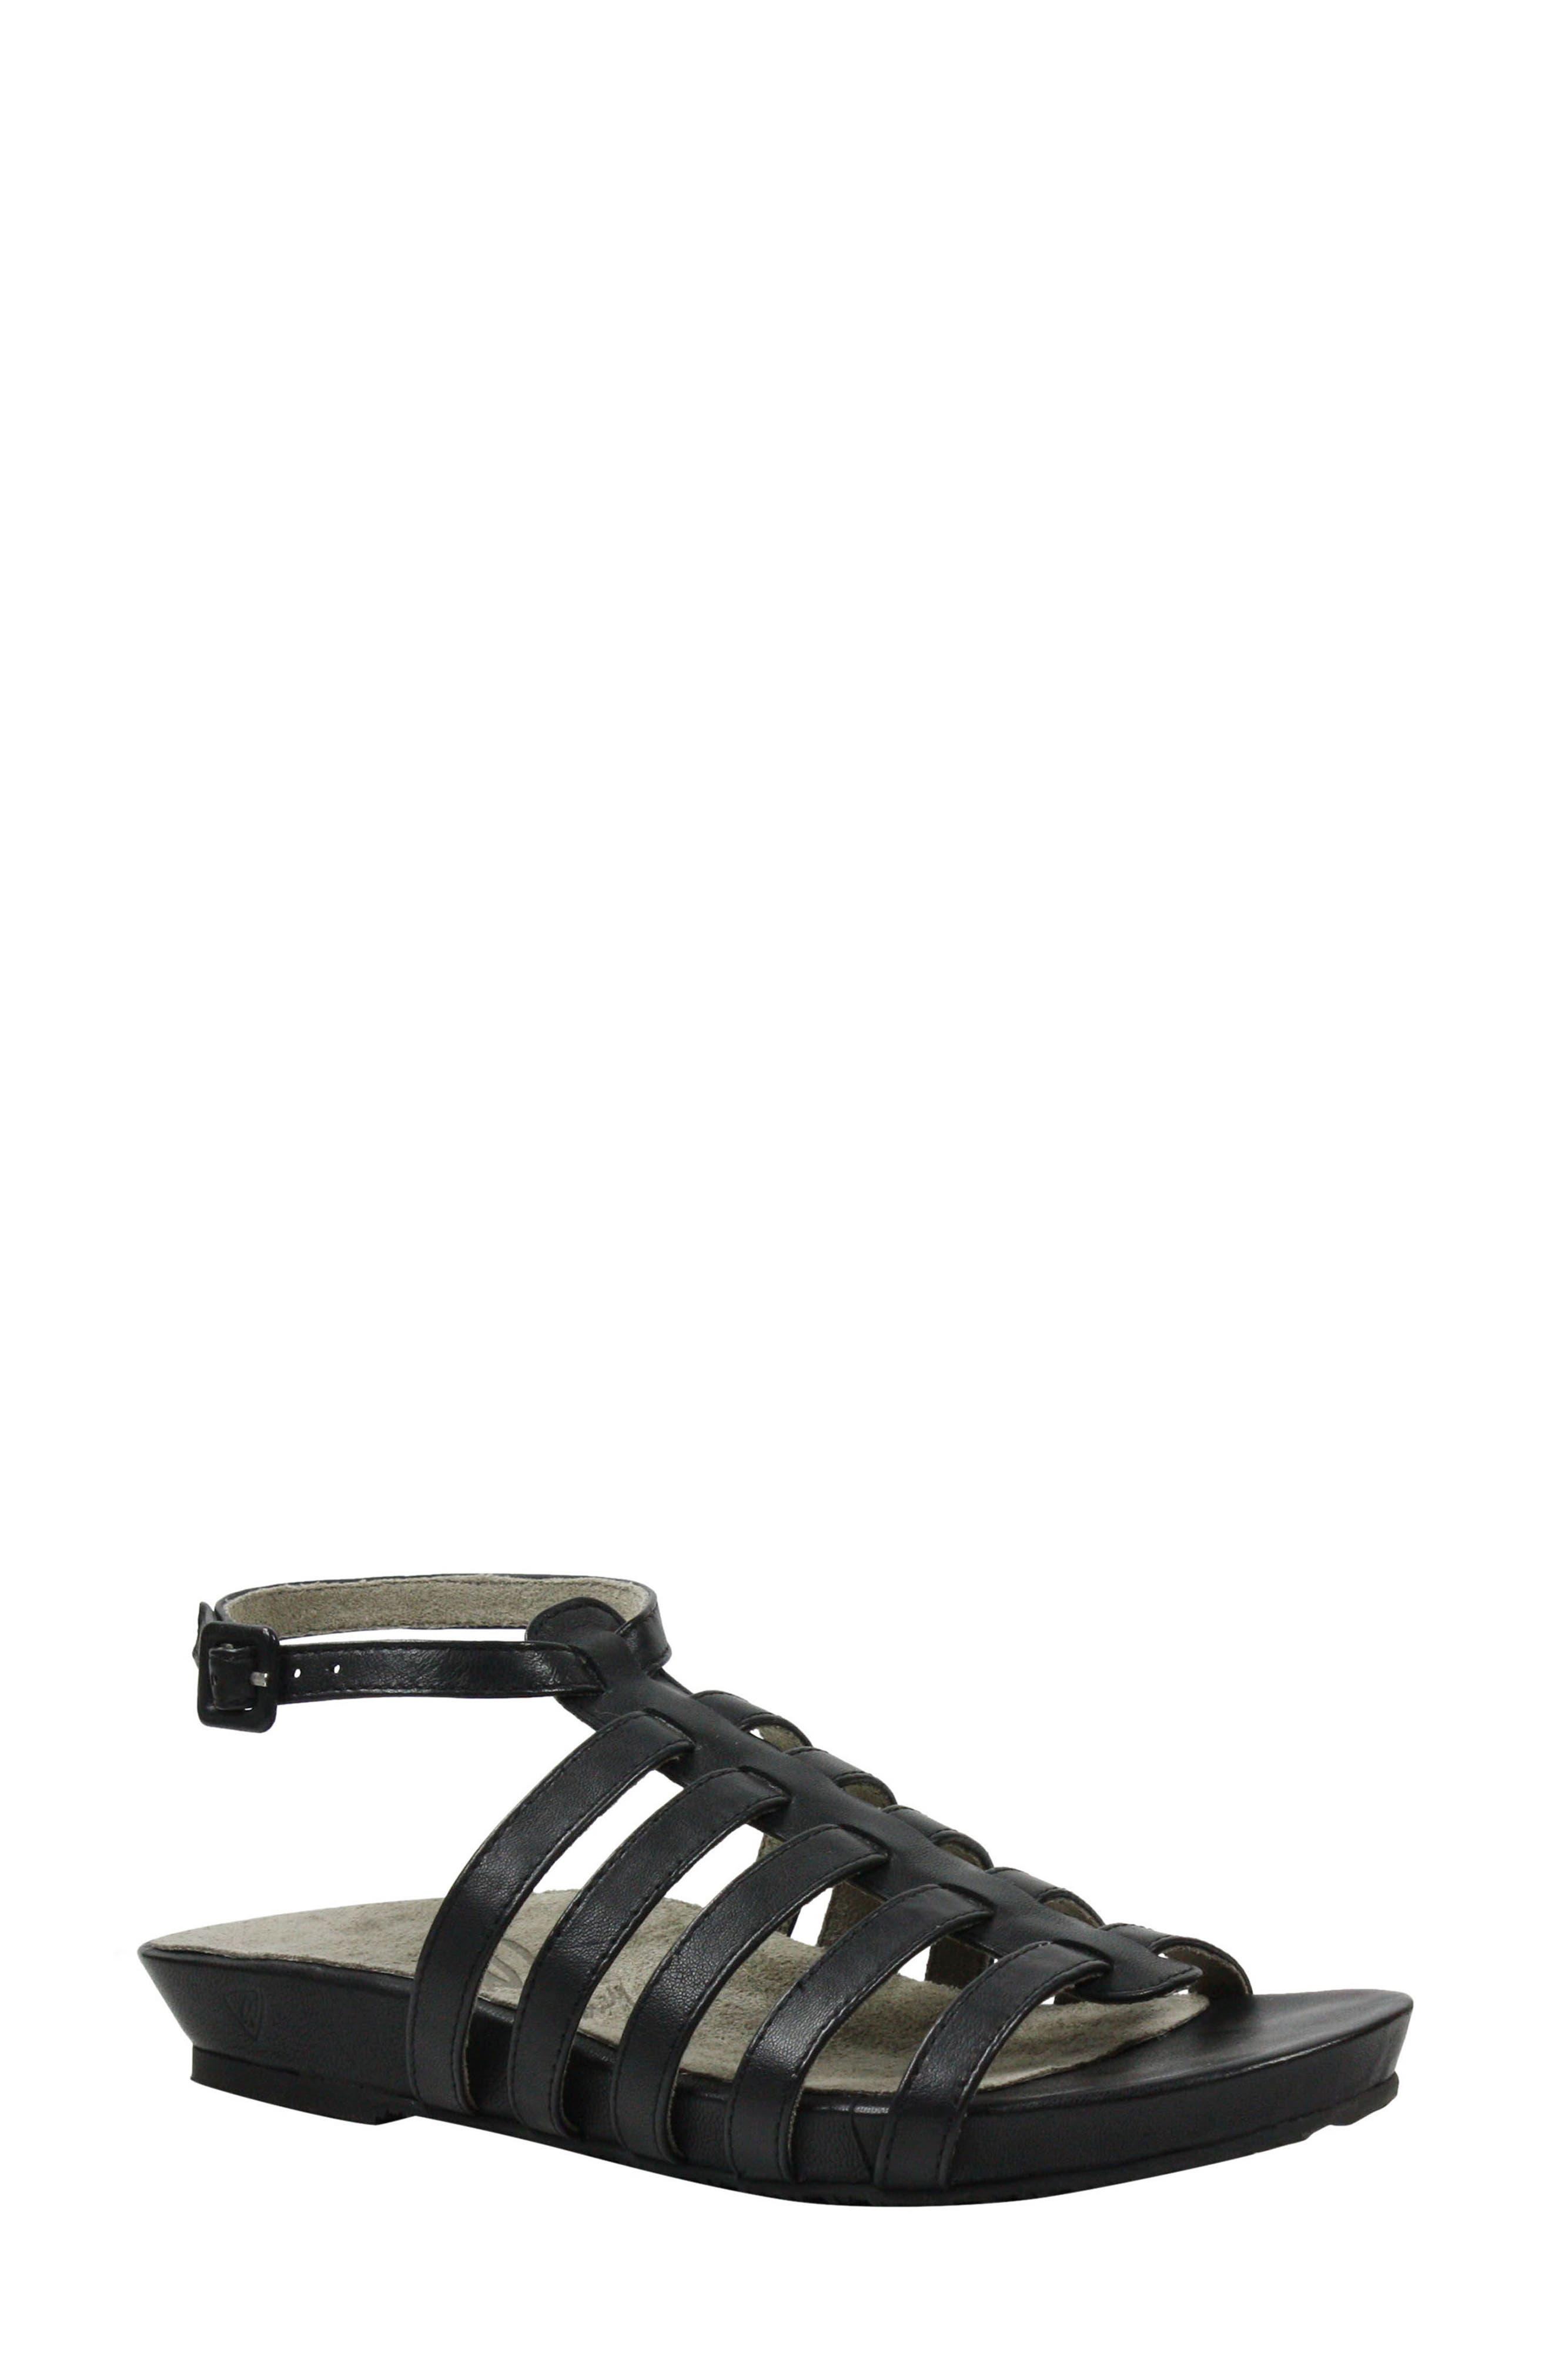 Delmor Ankle Strap Sandal,                         Main,                         color, BLACK LEATHER